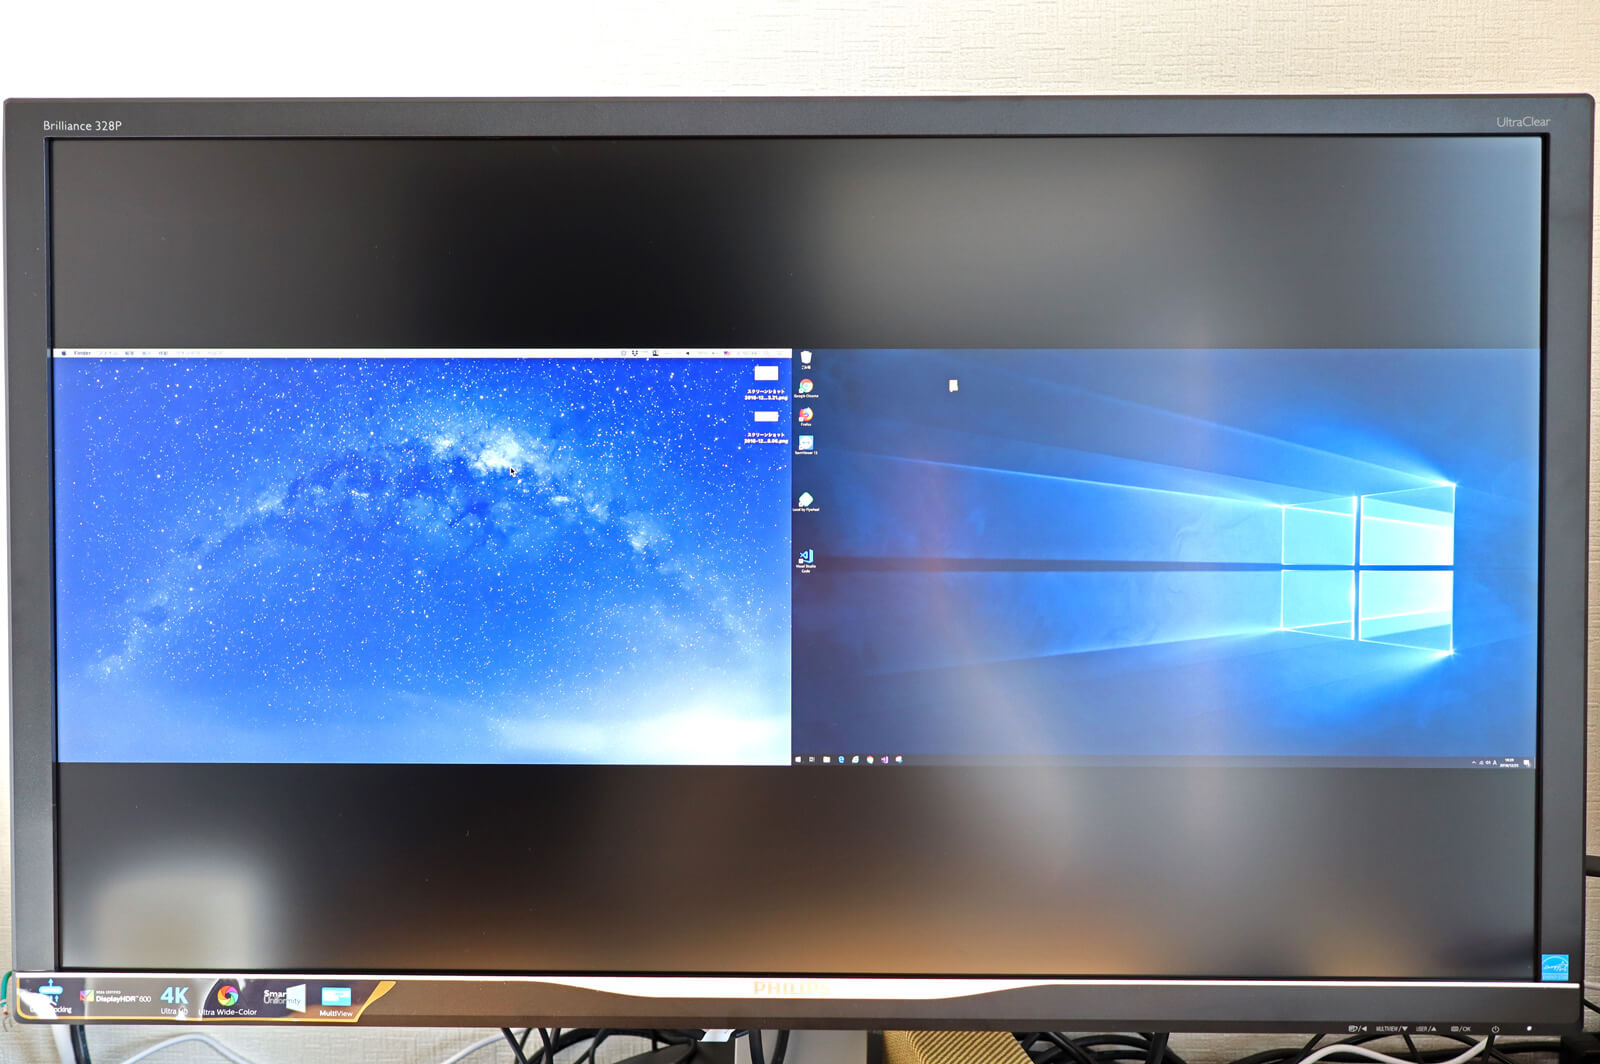 PHILIPSの328P6VUBREB/11のPBP機能でMacとWindowsを同時に表示